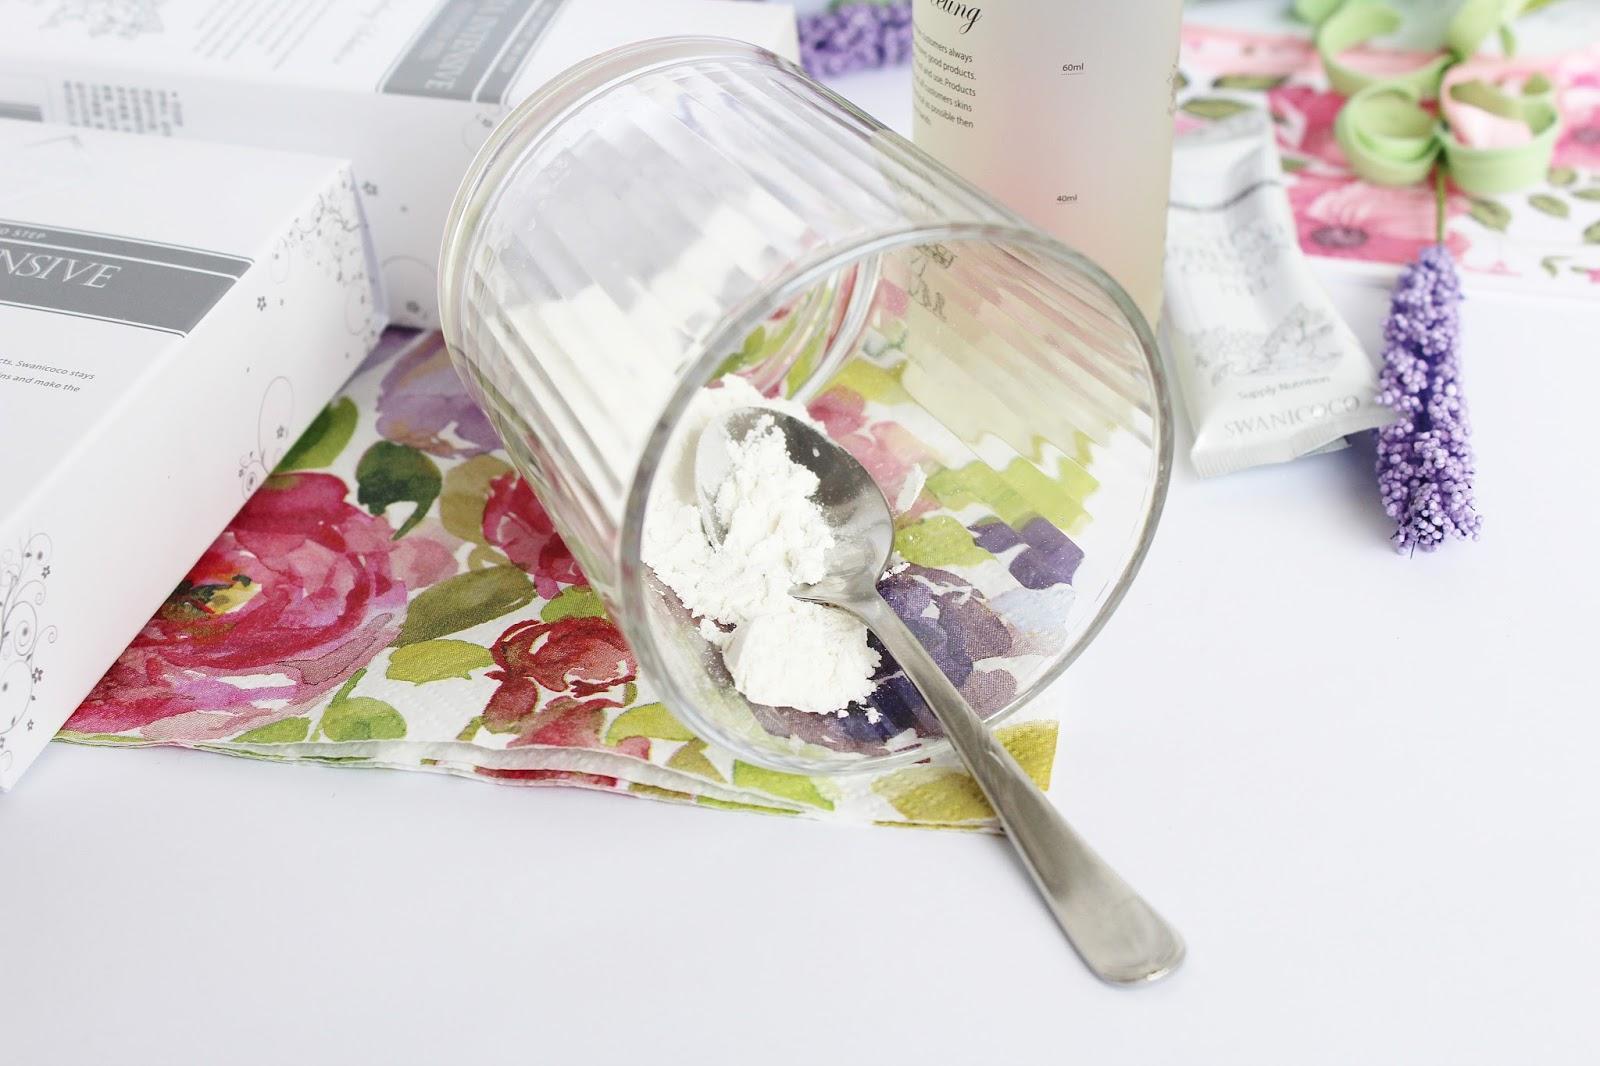 Swanicoco, Vita Intensive Oxygen Peel Whitening Peeling